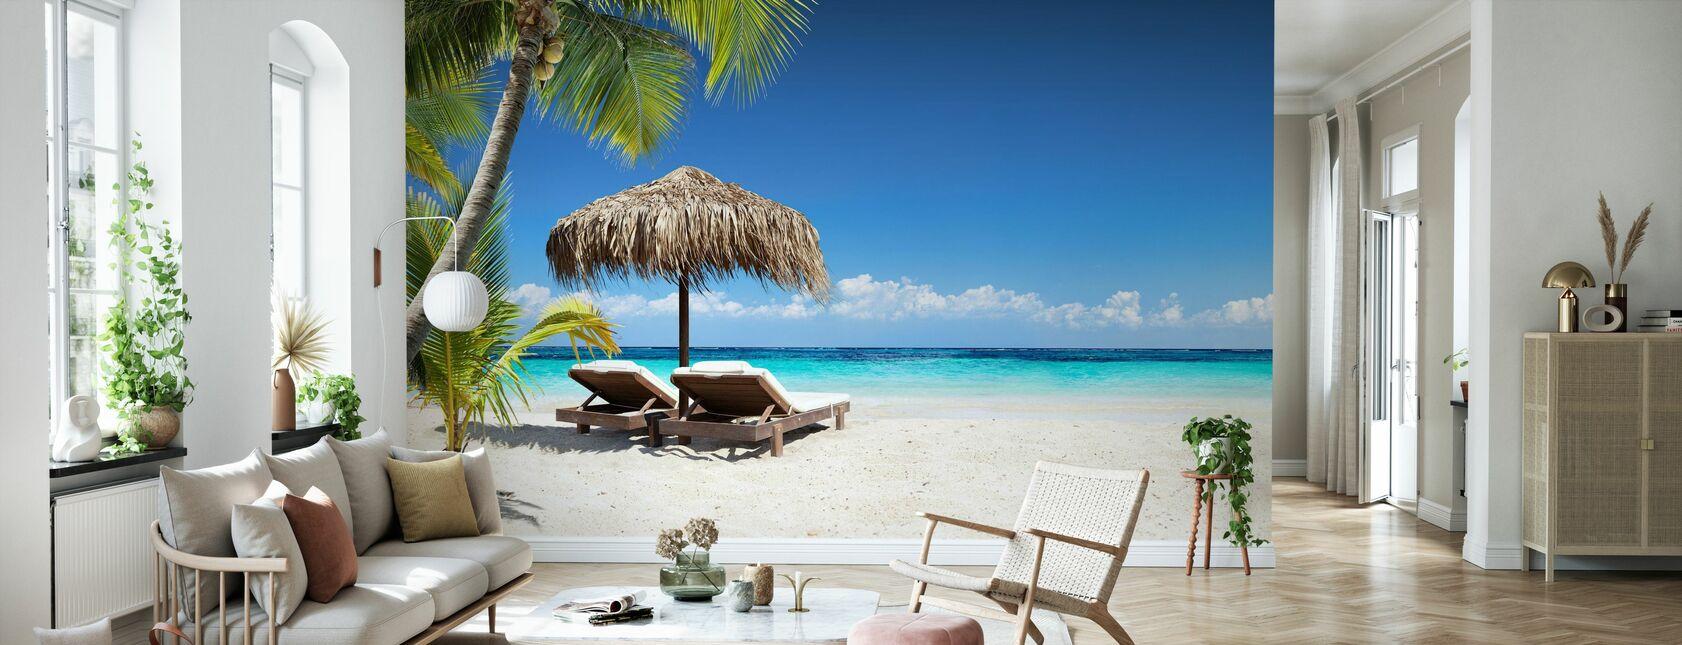 Coral Beach - Wallpaper - Living Room